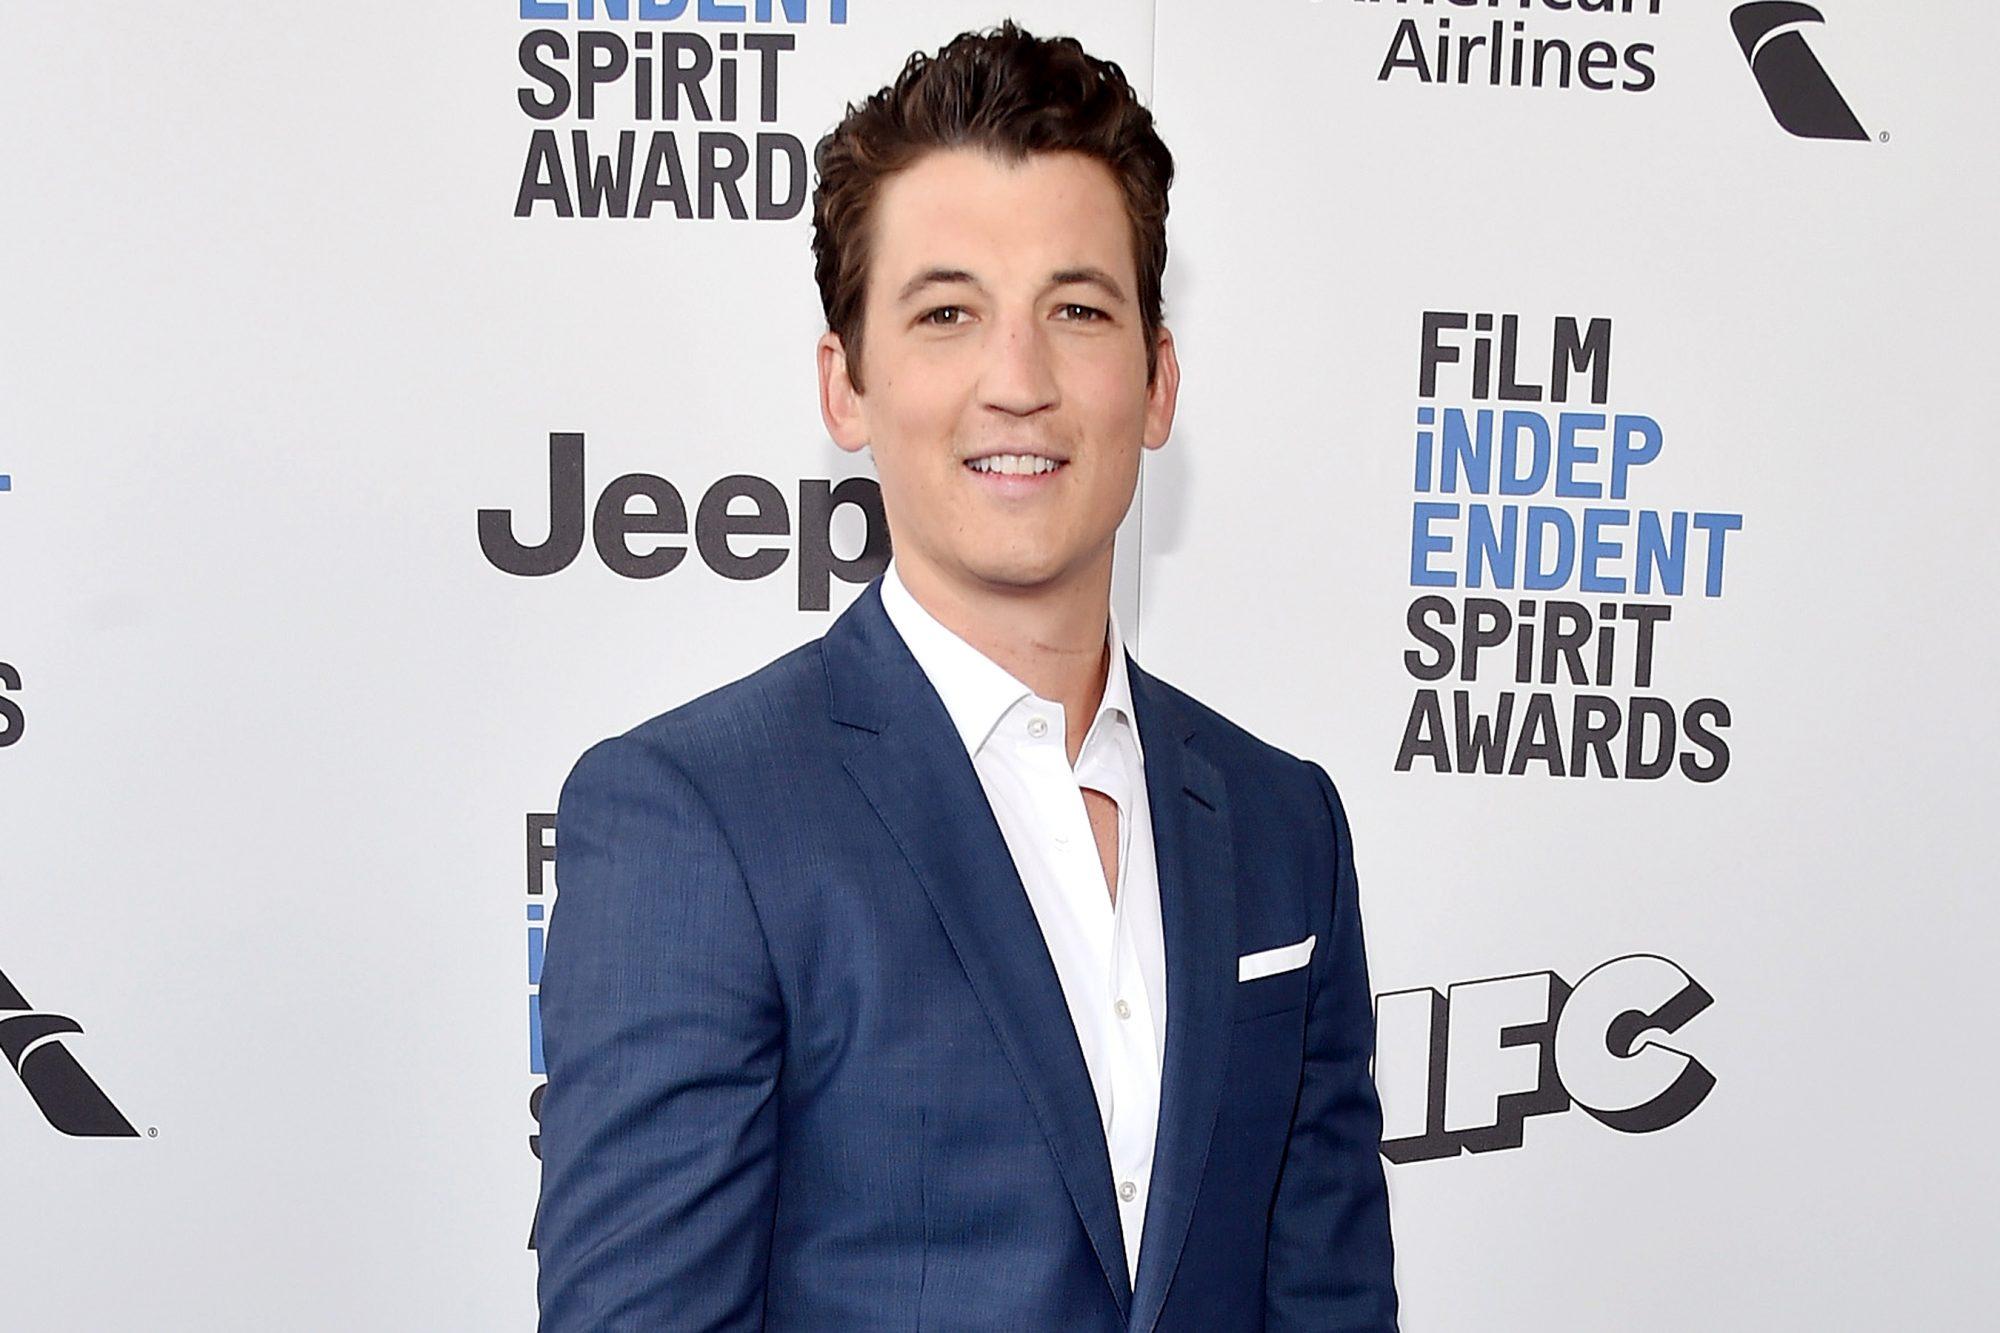 2017 Film Independent Spirit Awards  - Red Carpet